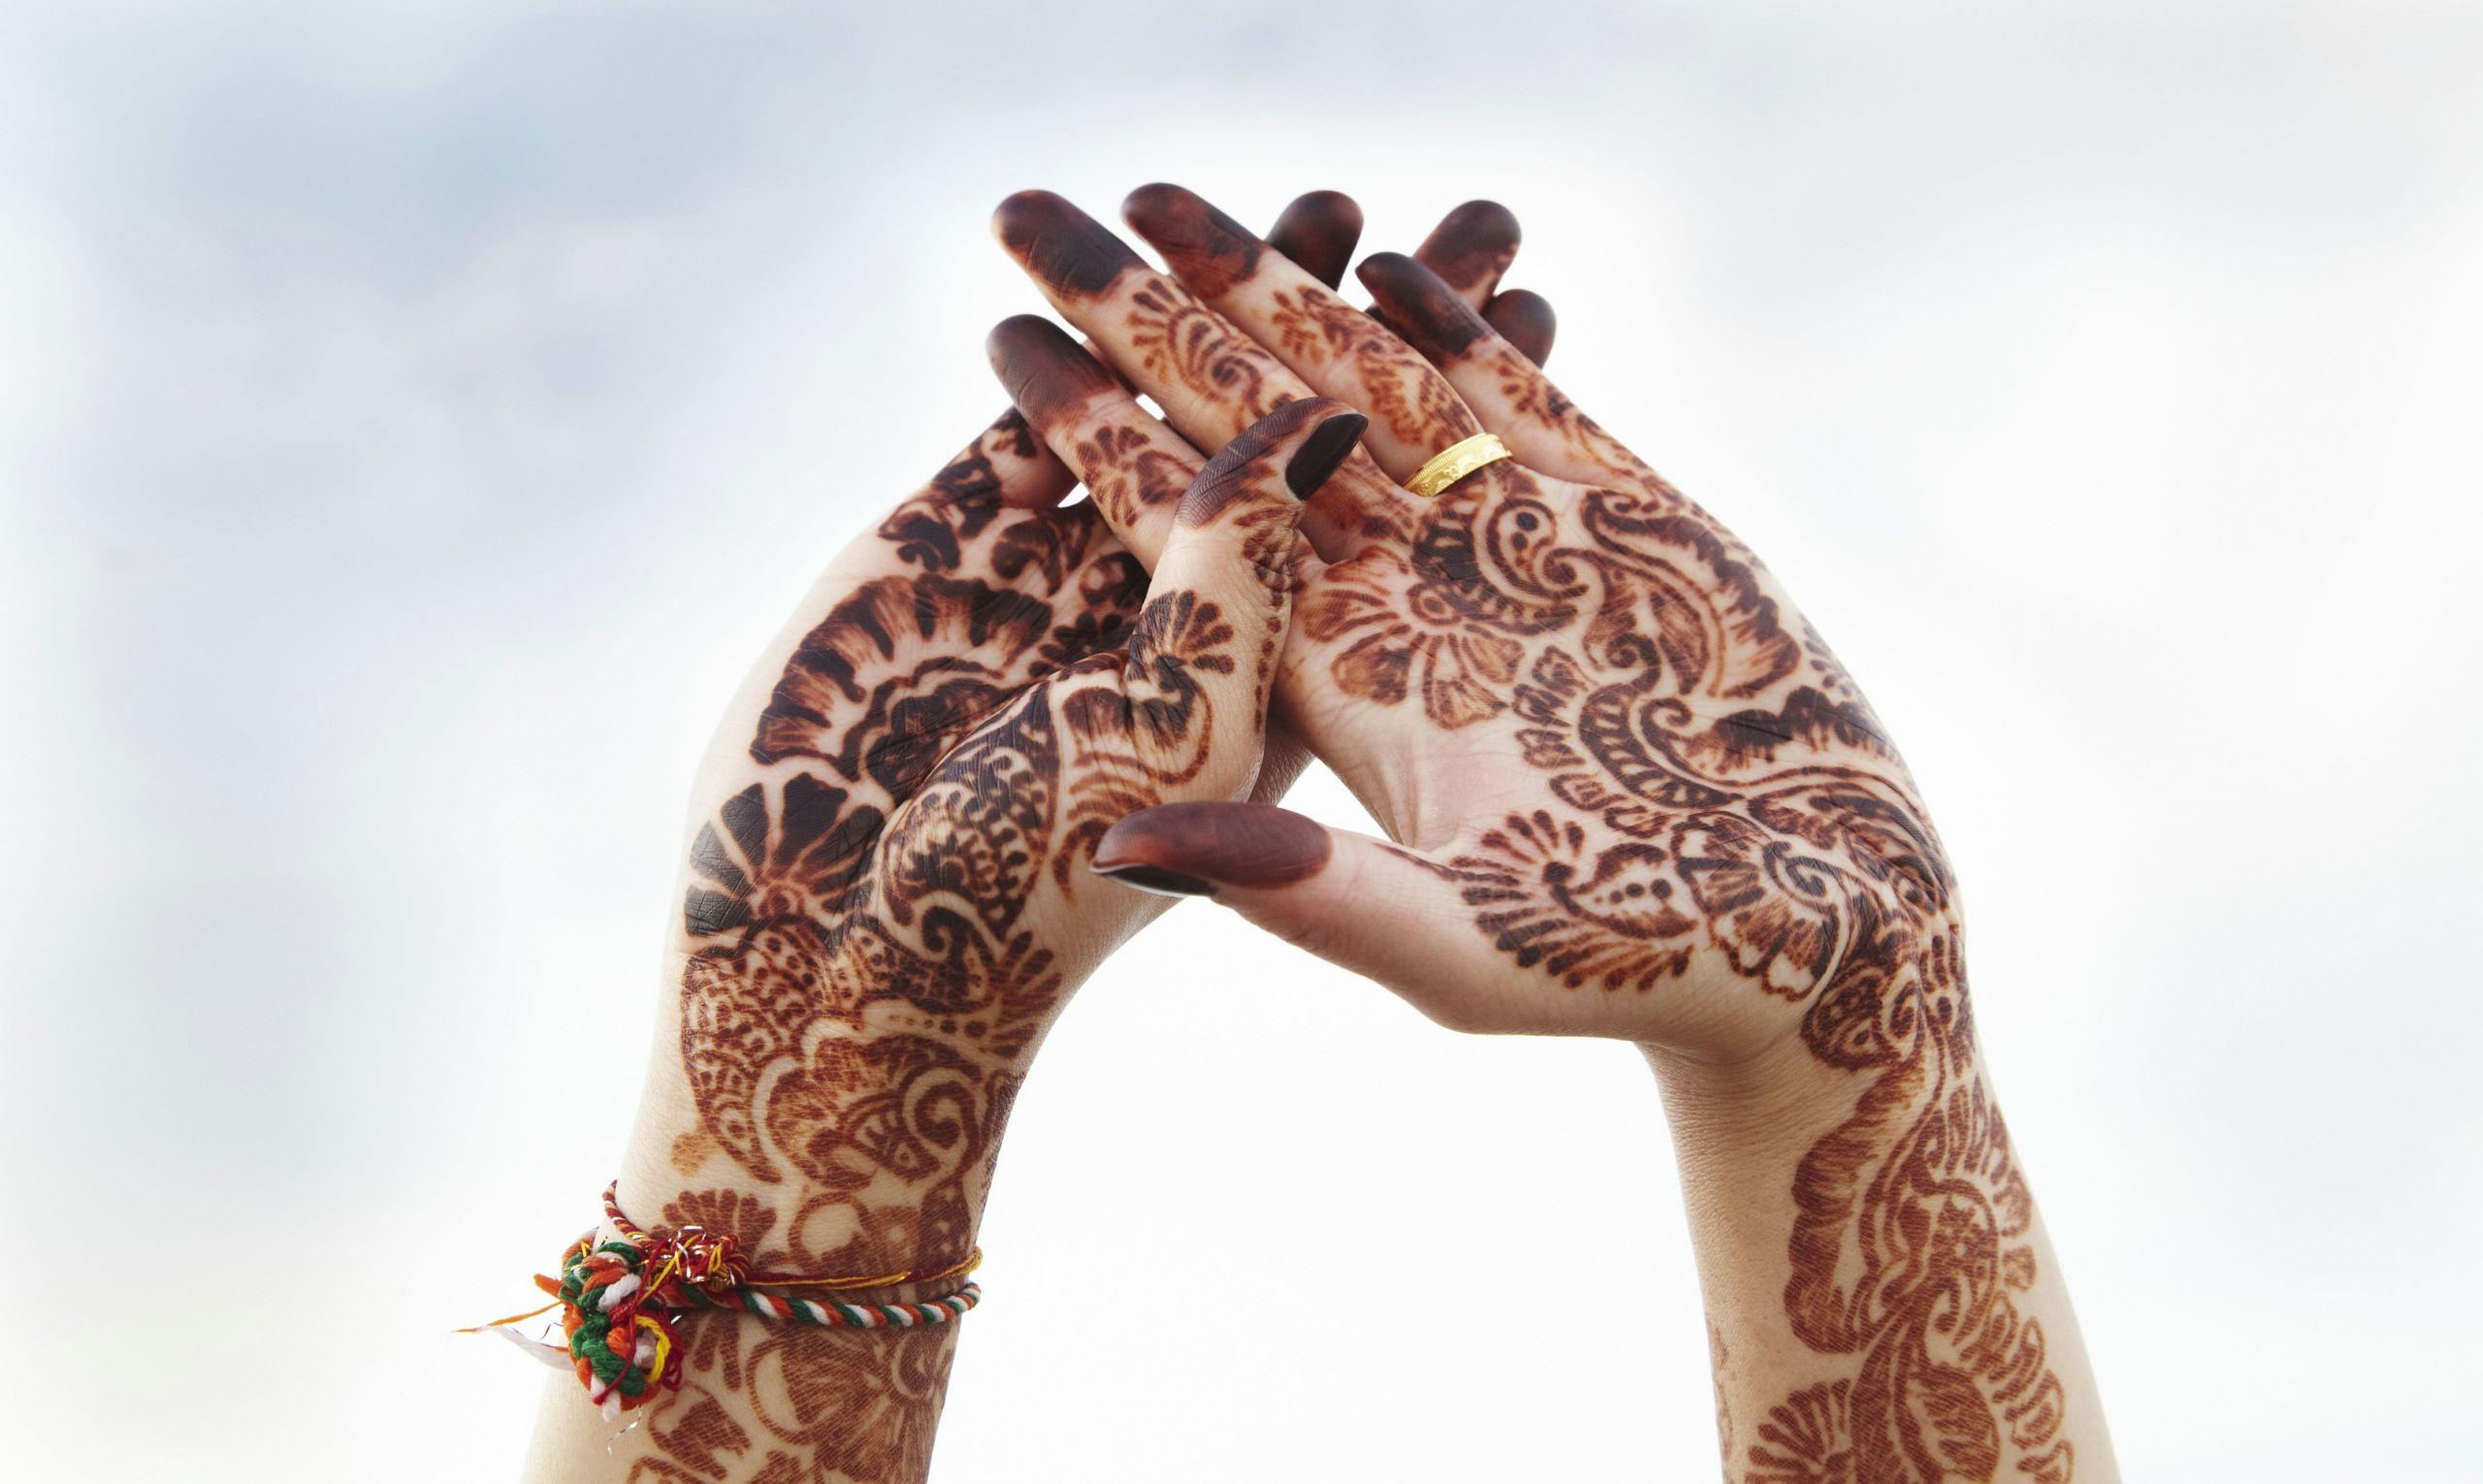 simple geometric tattoo designs henna tattooing symbols and meanings of simple geometric tattoo designs jpg